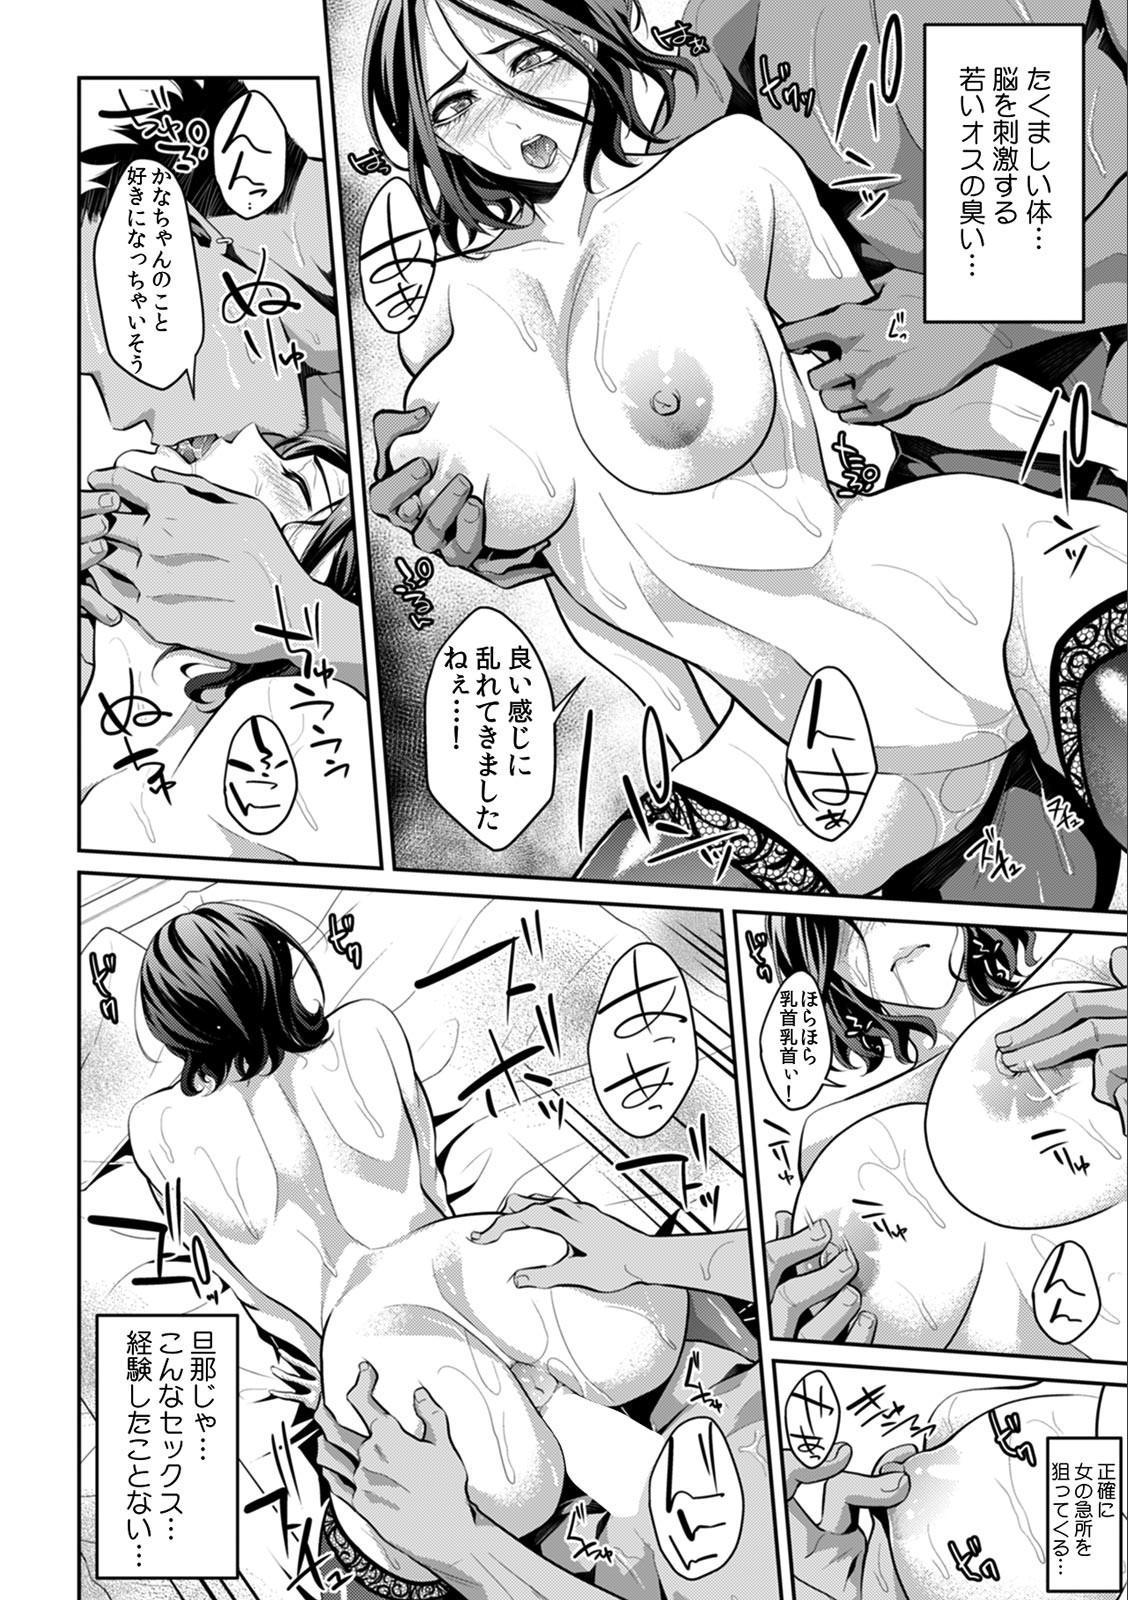 Descent to lewdness, Netorare Sex 17